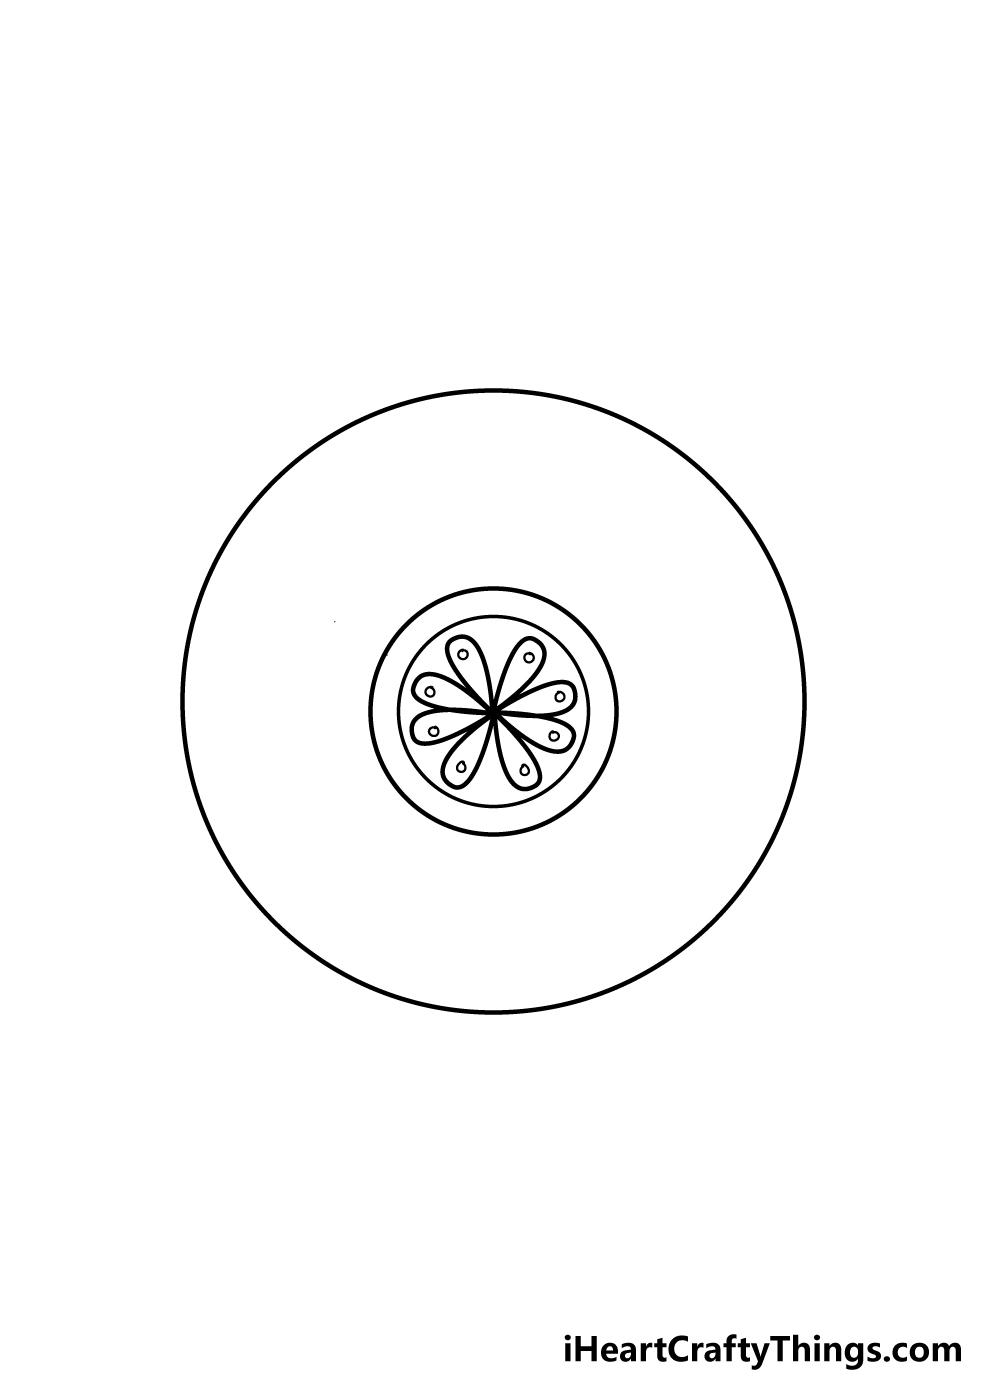 mandala drawing step 4